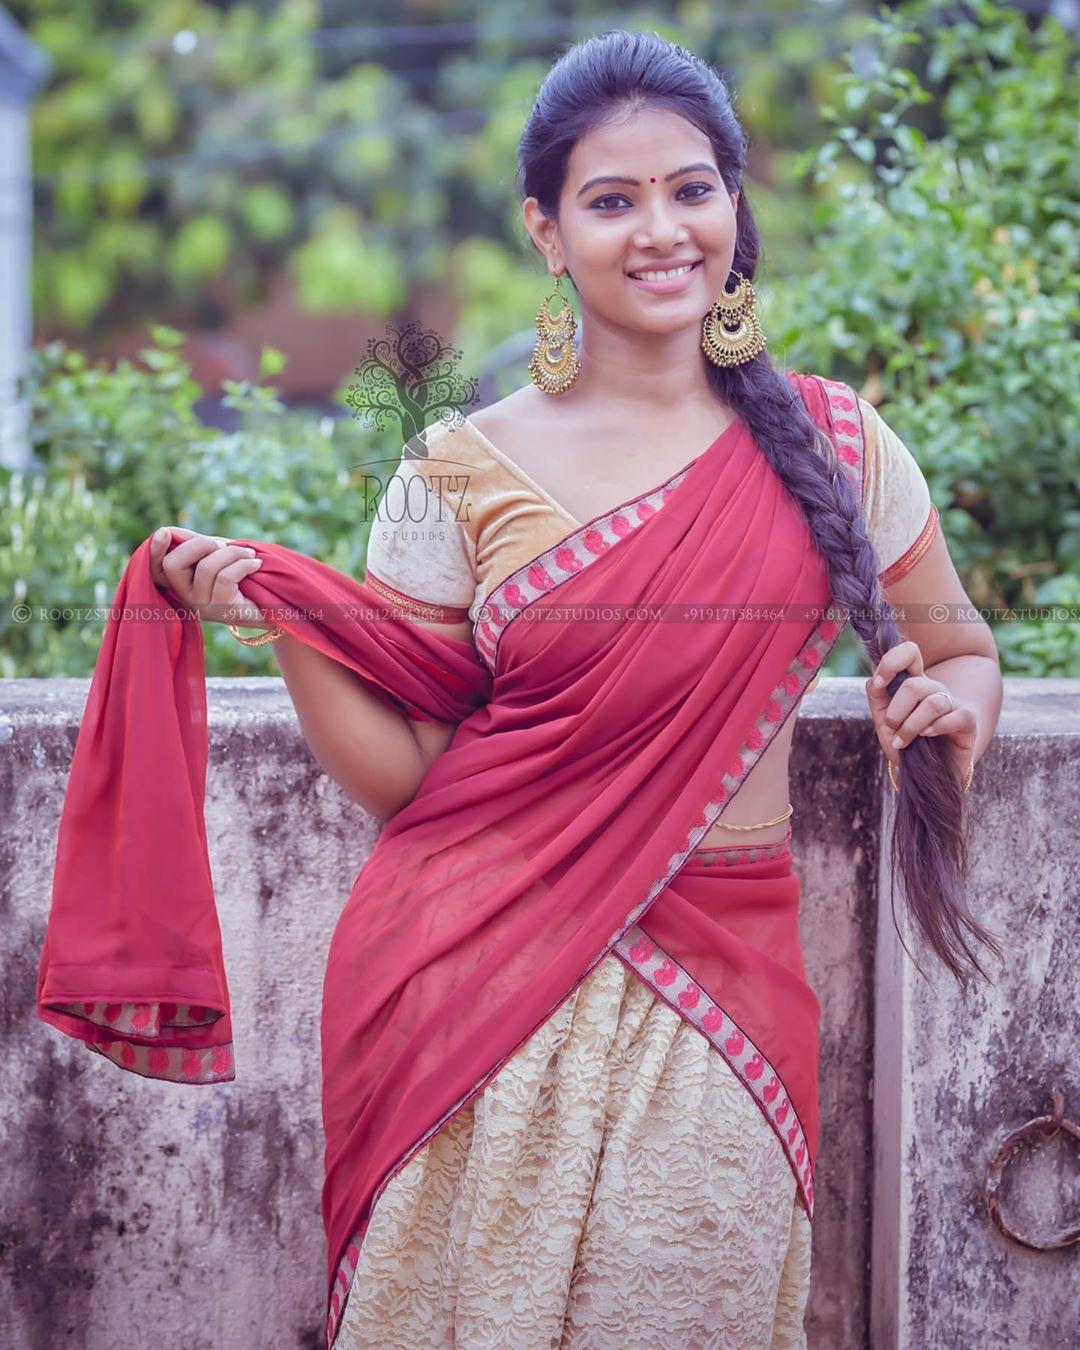 dhivya dhuraisamy homely saree photos (11)